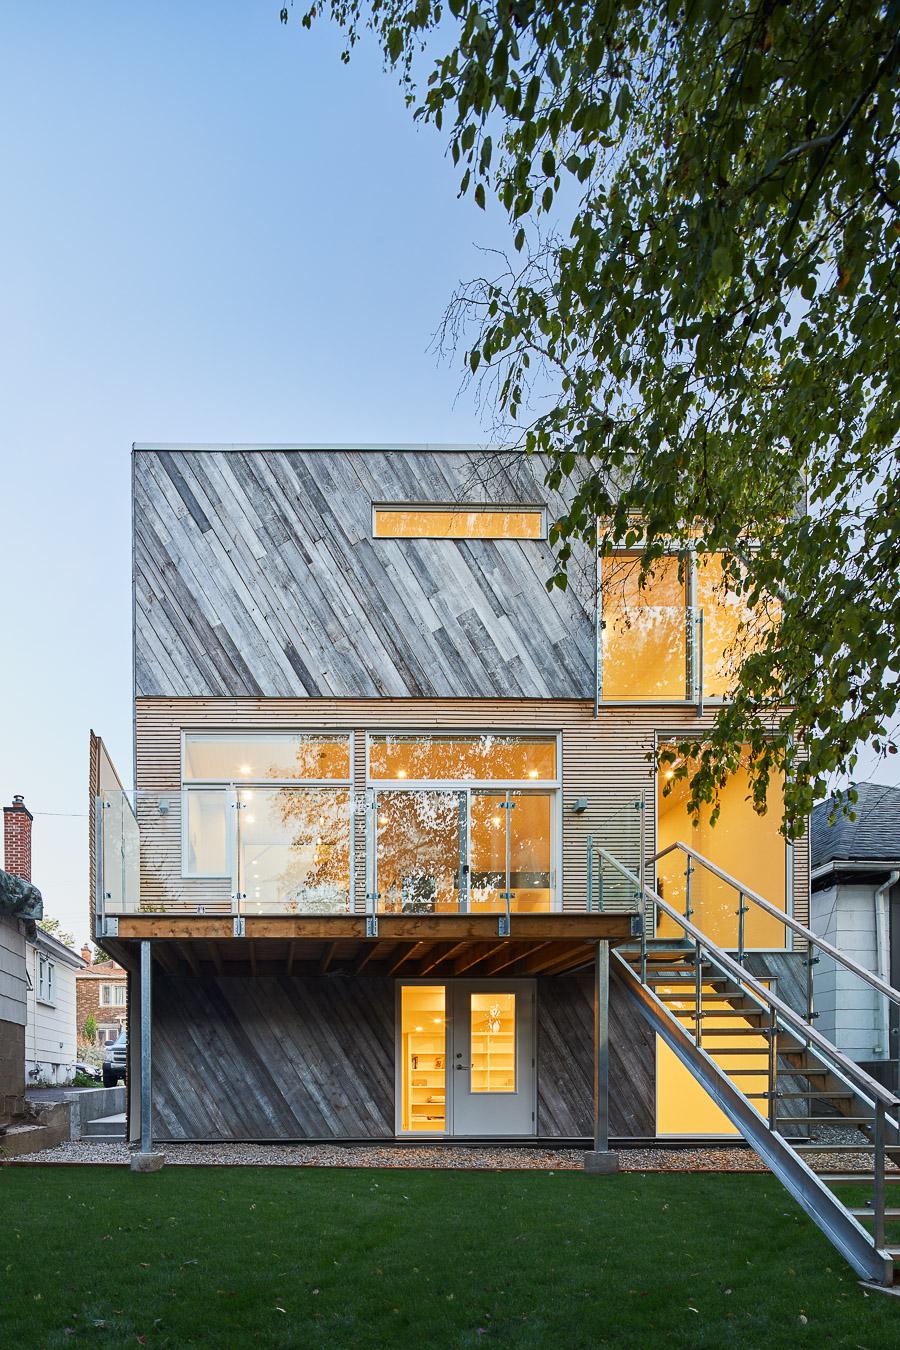 005-Shean Architects Fentiman.jpg